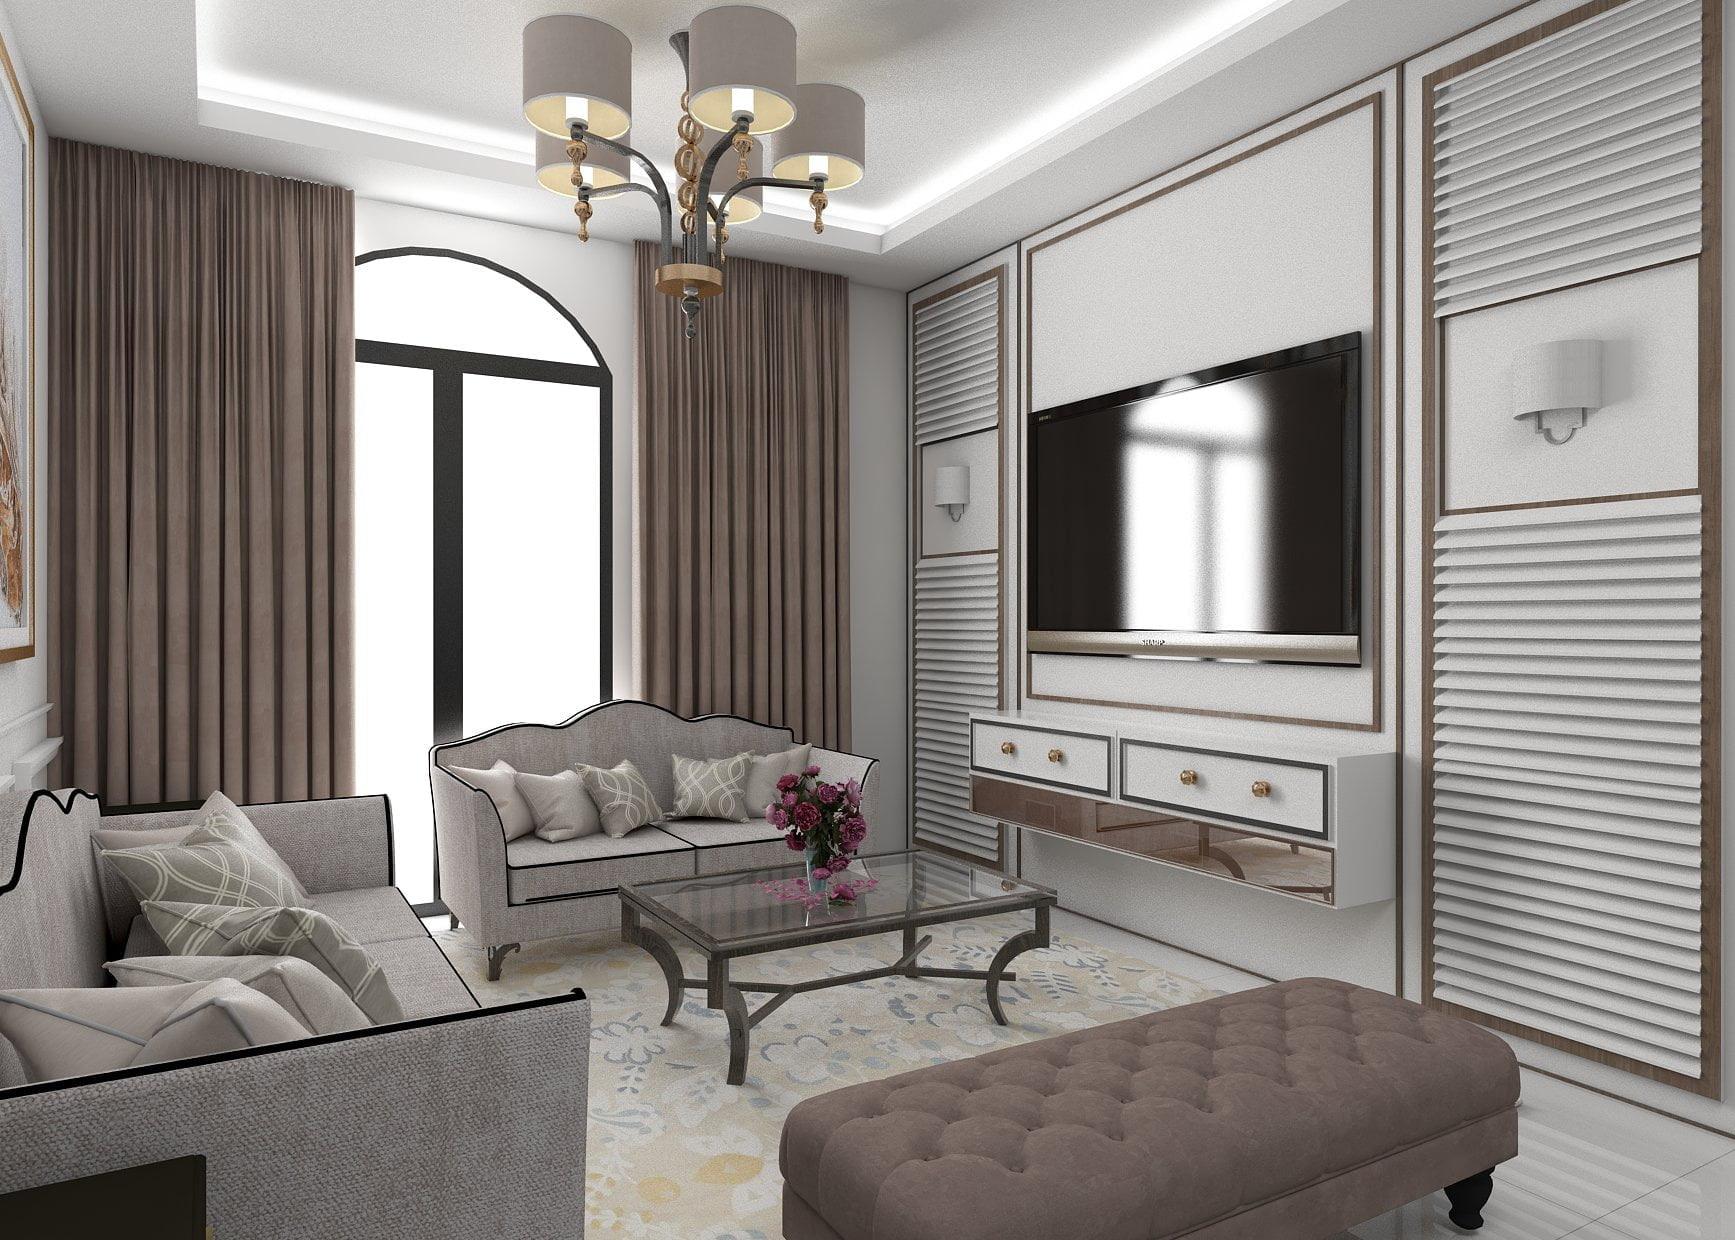 Home Furnishing Stores Kuala Lumpur Malaysia | Laurea 3